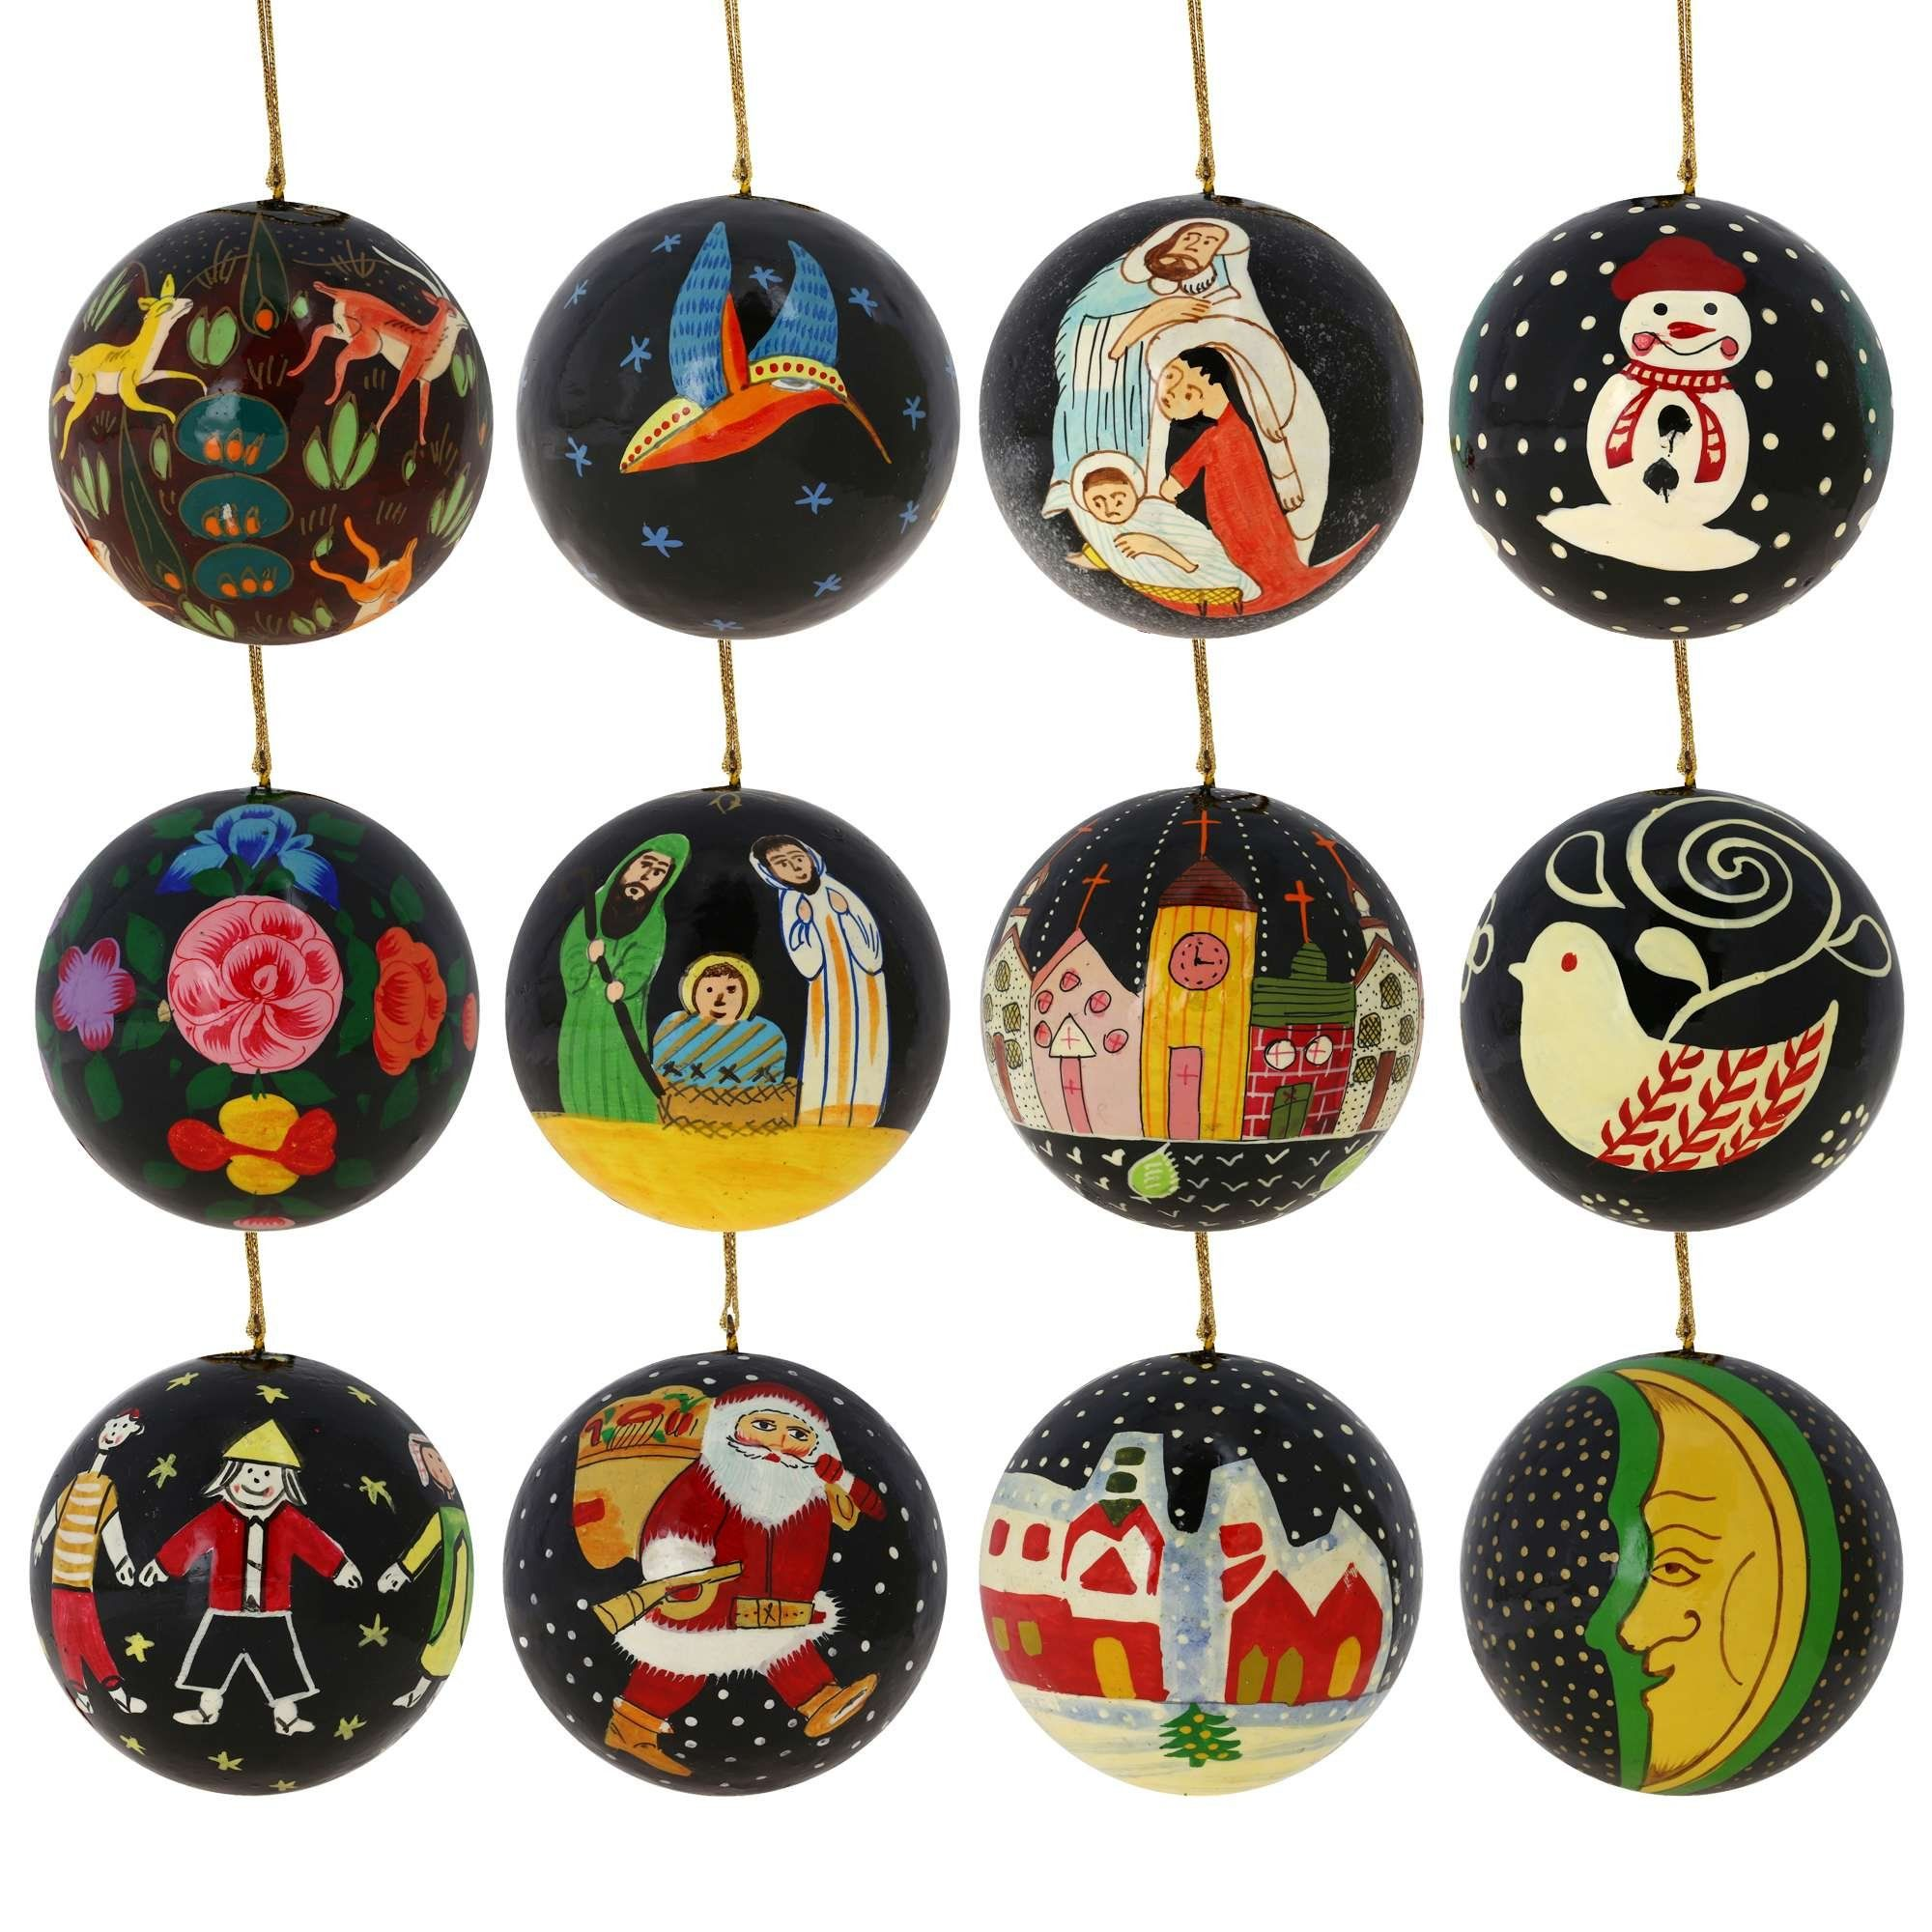 Amazon Com Set Of 12 Black Paper Mache Christmas Ornaments Handmade In Kashmir Paper Mache Christmas Black Christmas Decorations Christmas Decorations Cheap